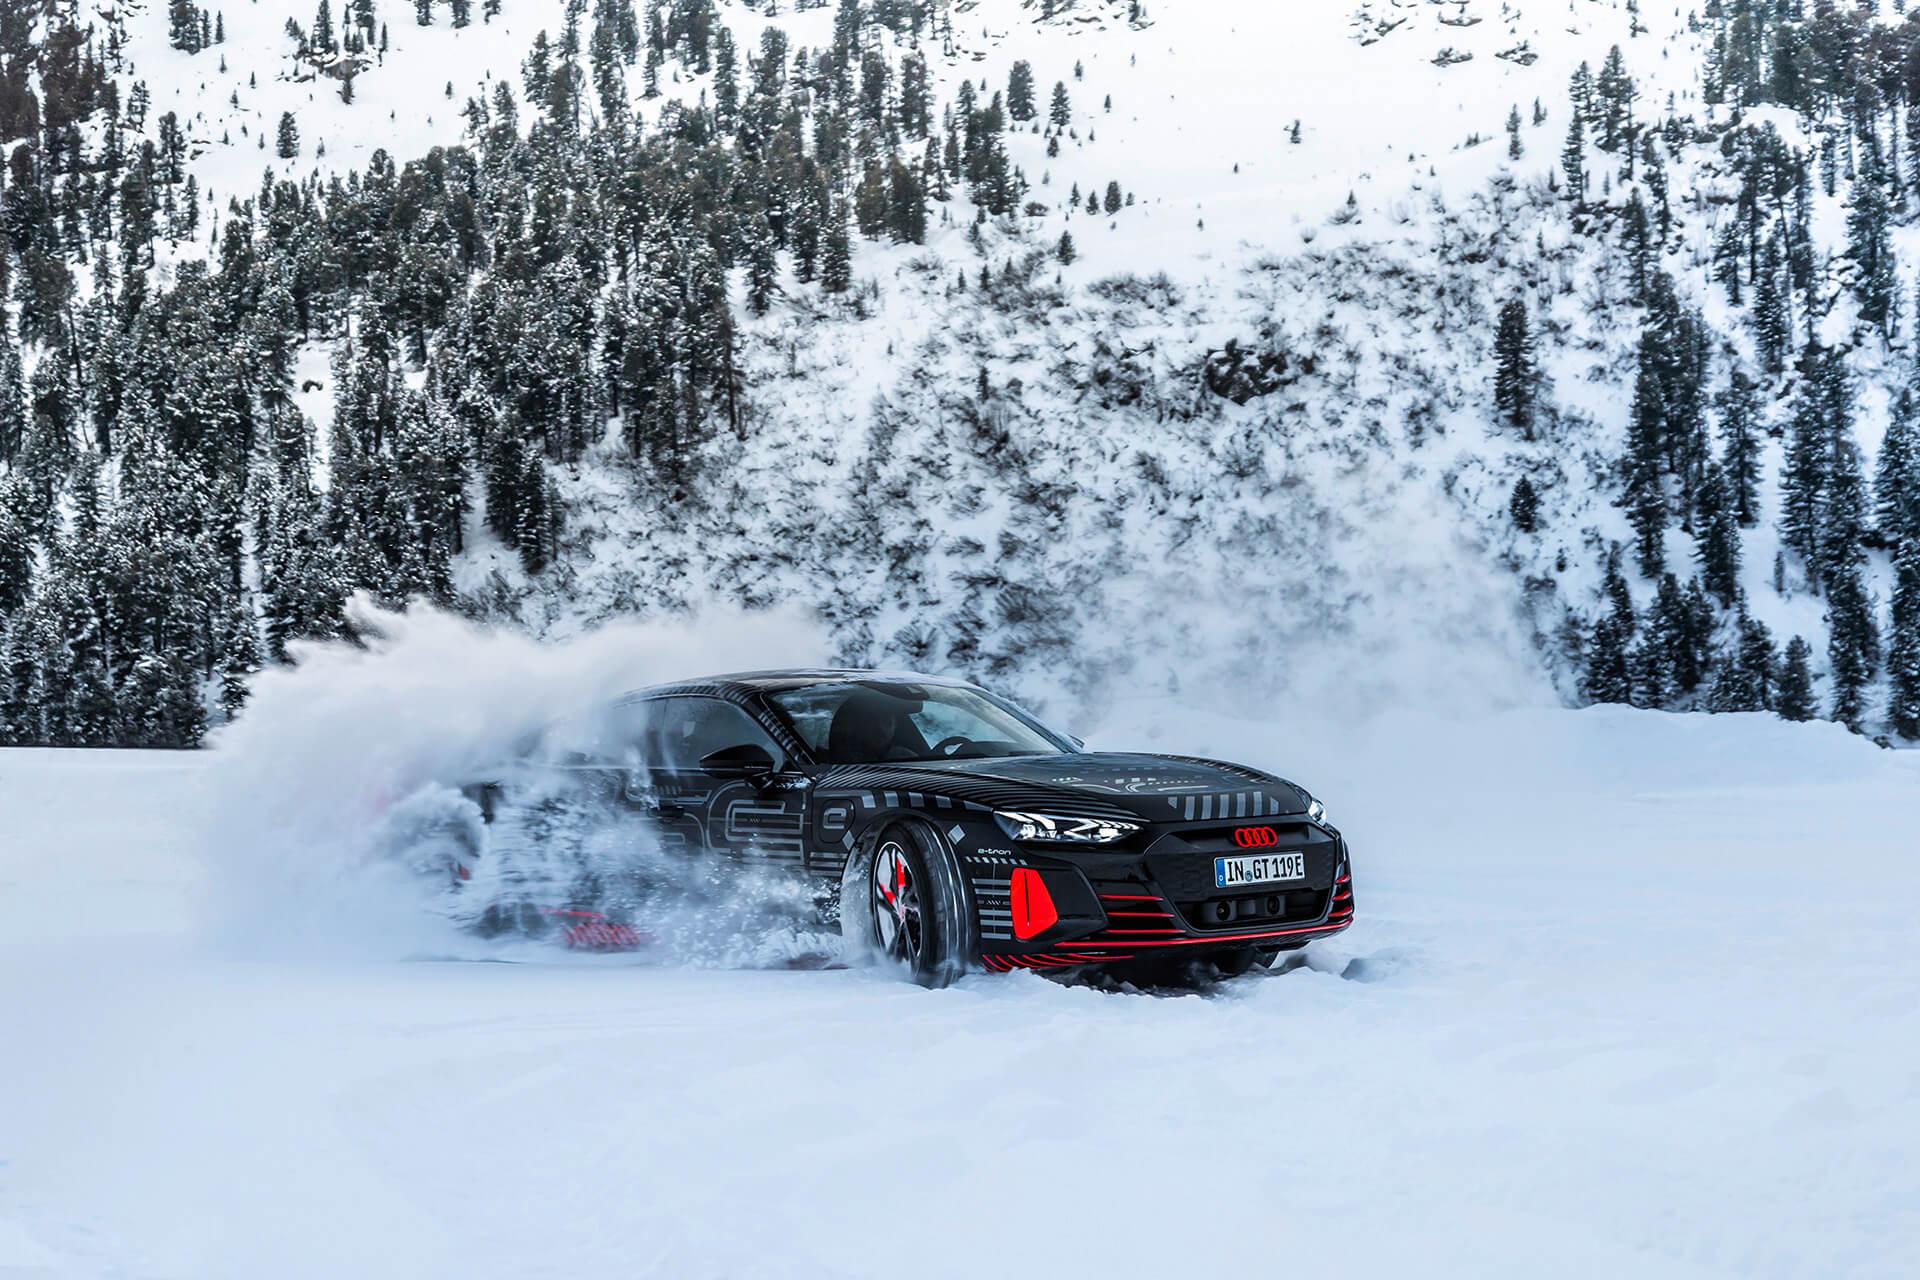 Audi e-tron GT μέσα στο χιόνι